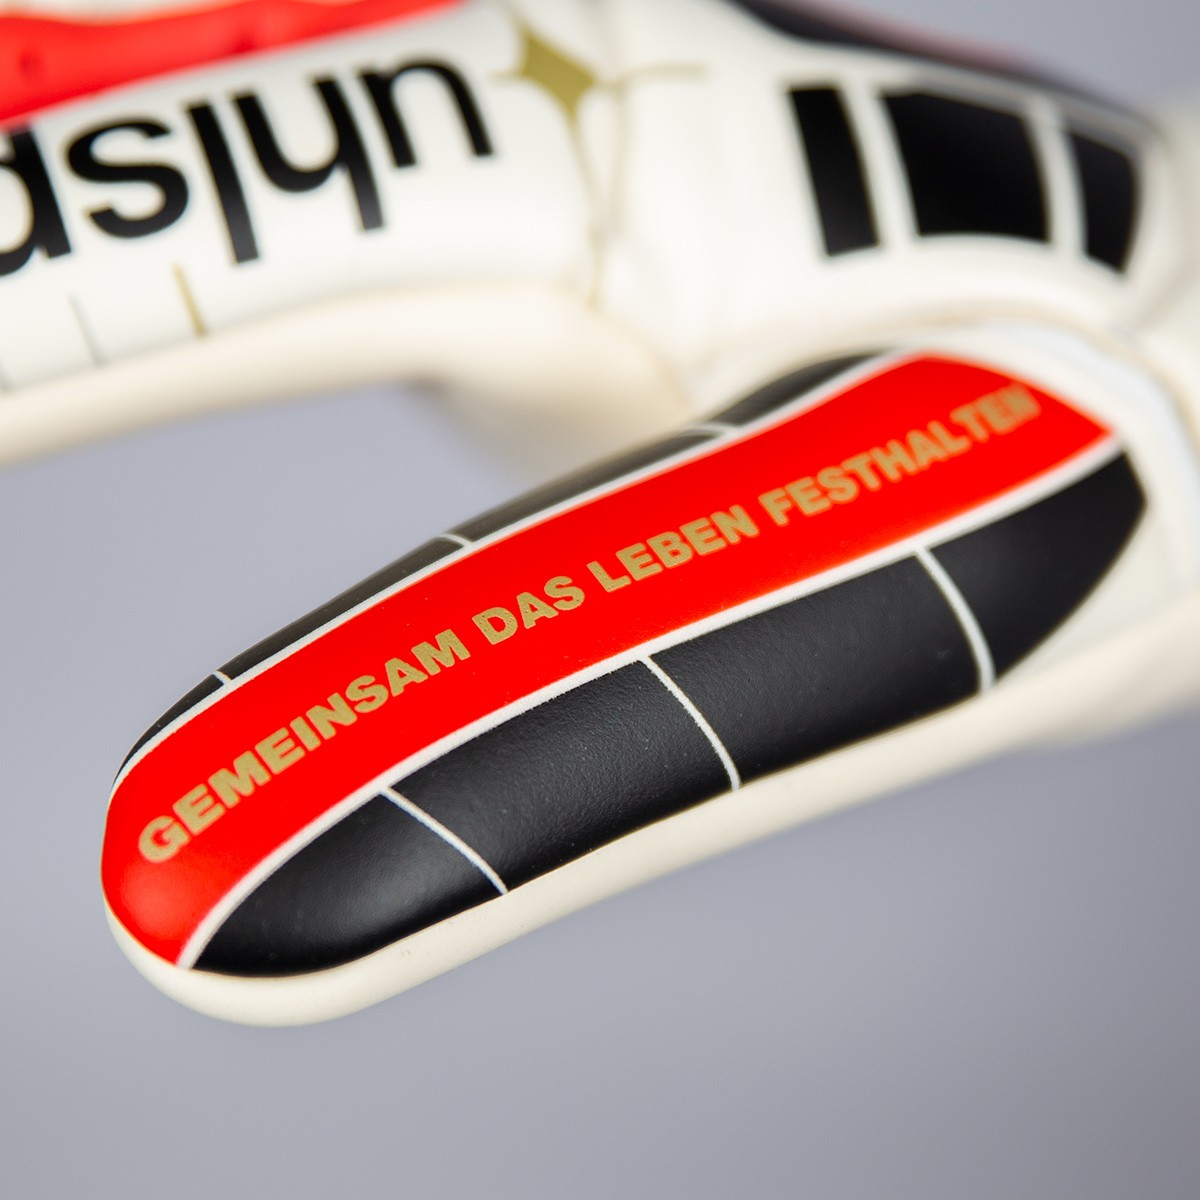 Robert Enke Handschuh Closeup Gemiensam das Leben festhalten